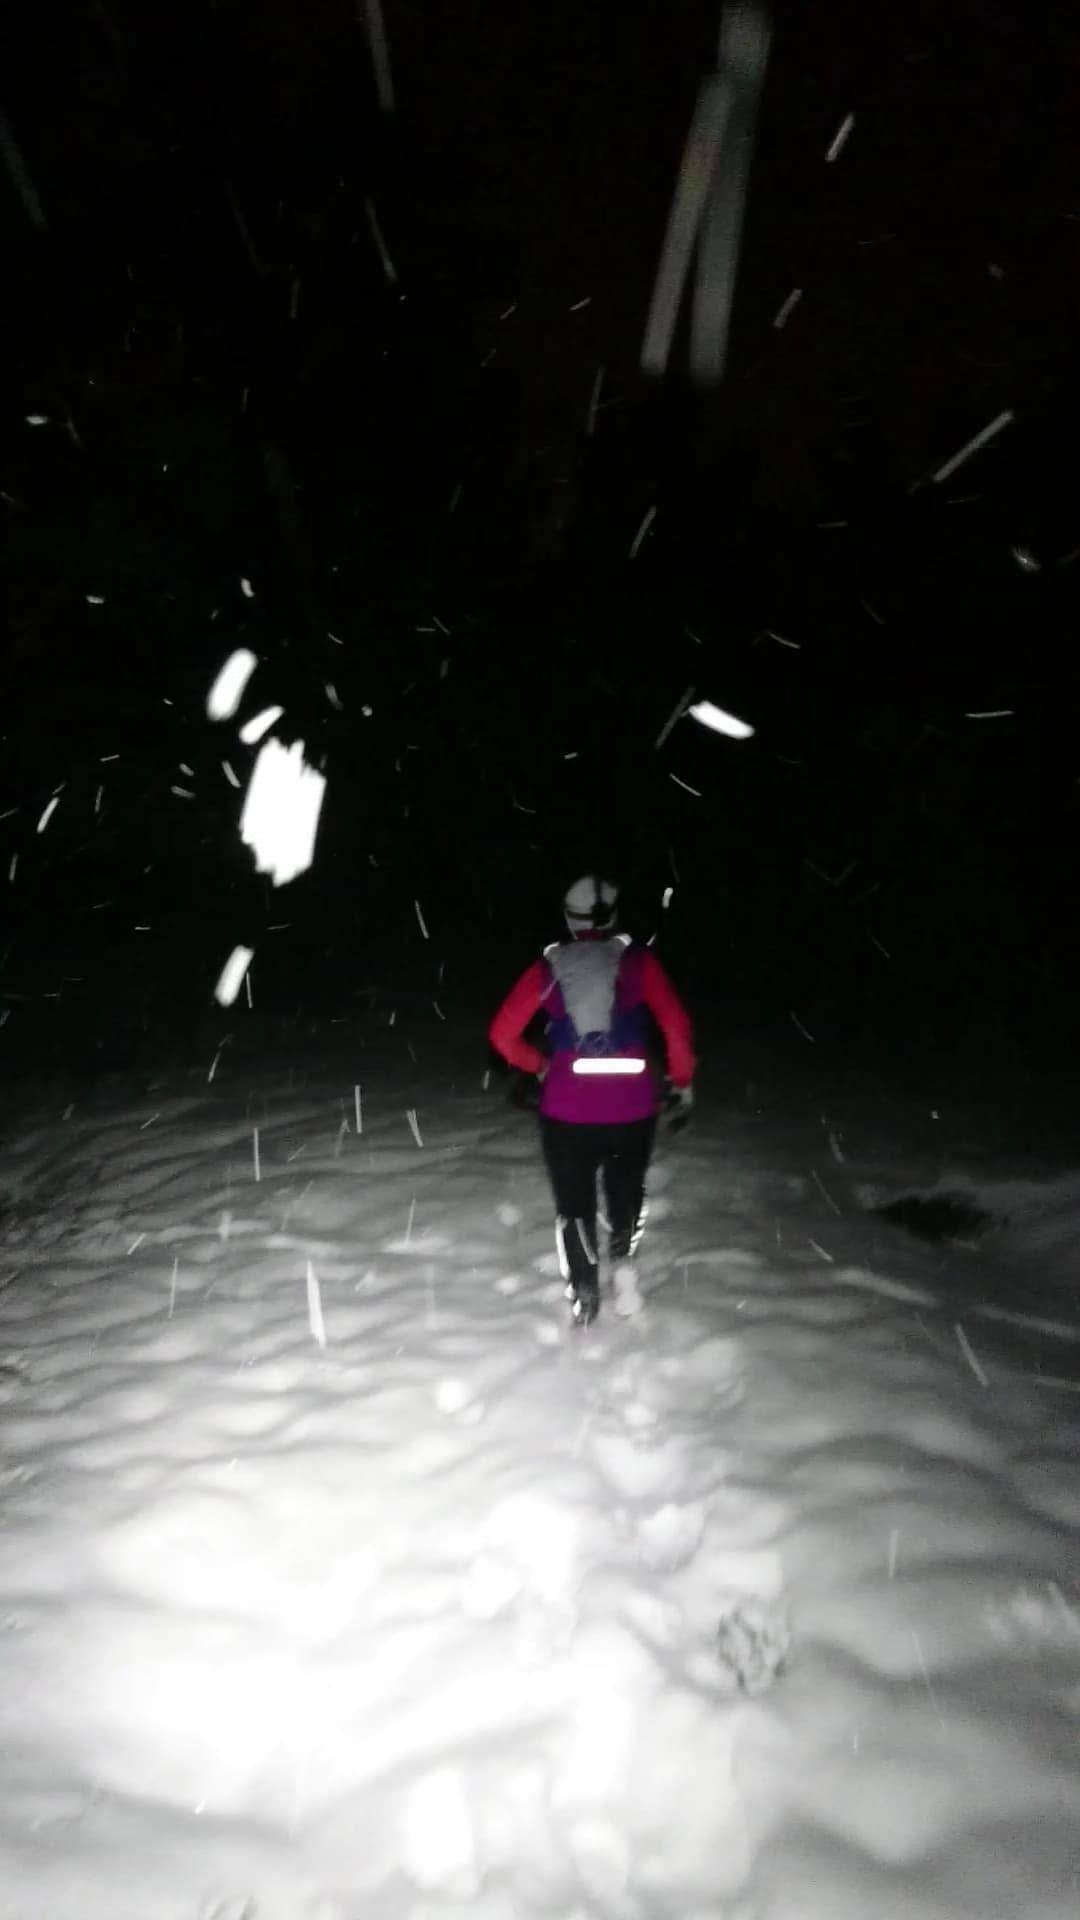 Snow running with headlights